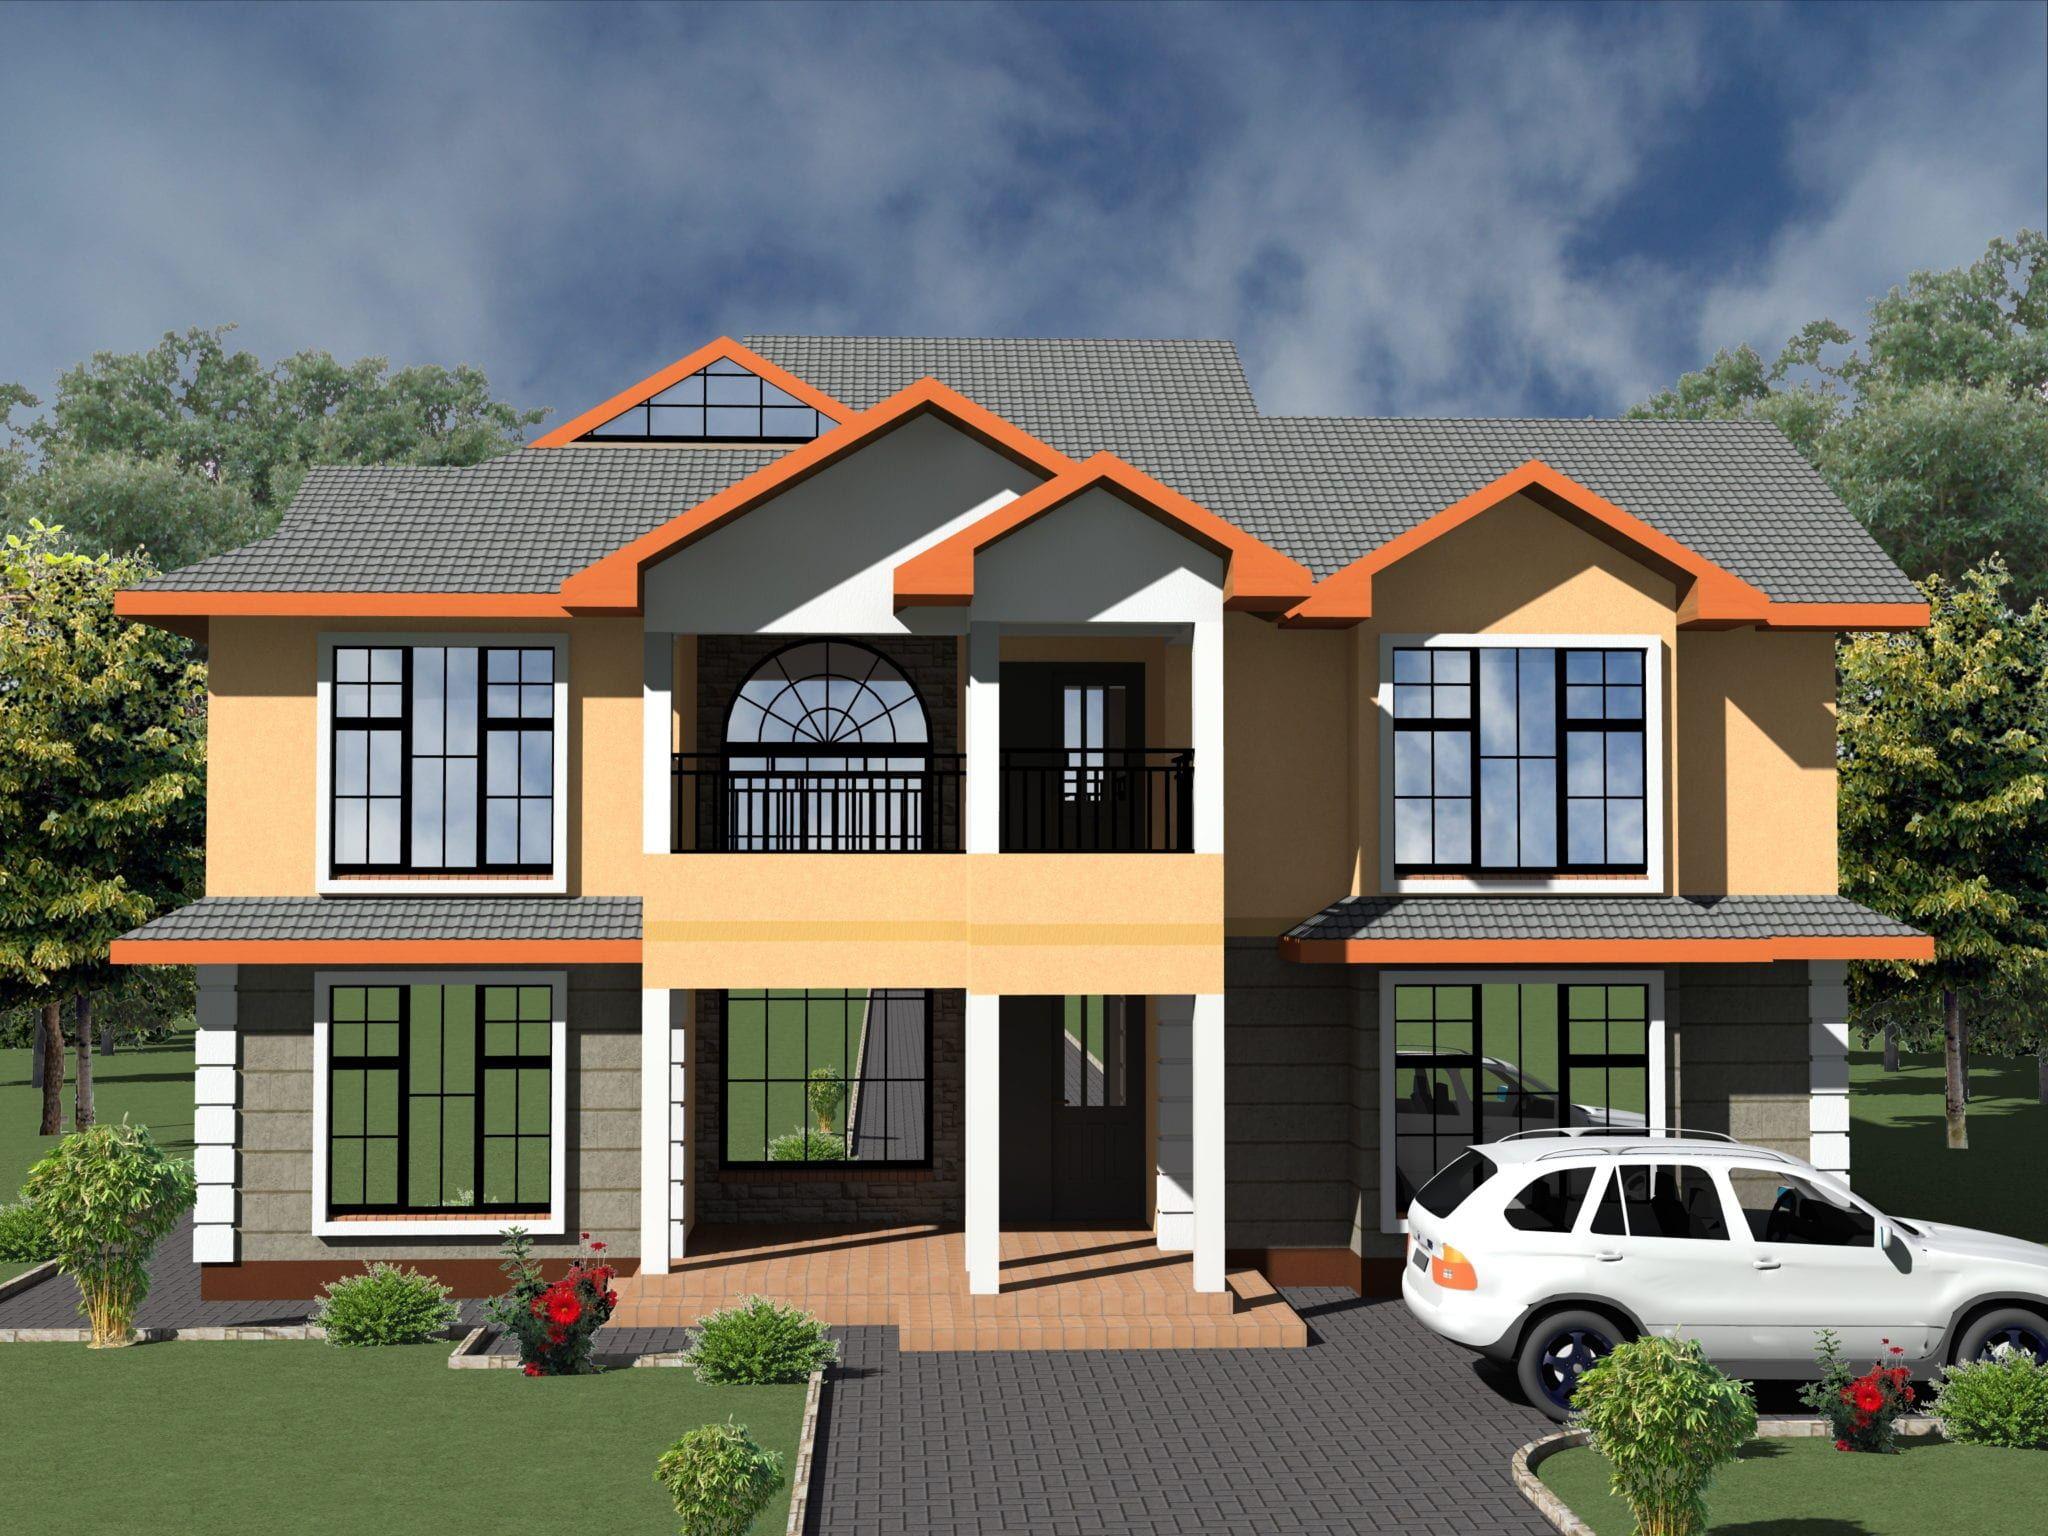 5 Bedroom House Designs In Kenya Hpd Consult En 2020 Casas